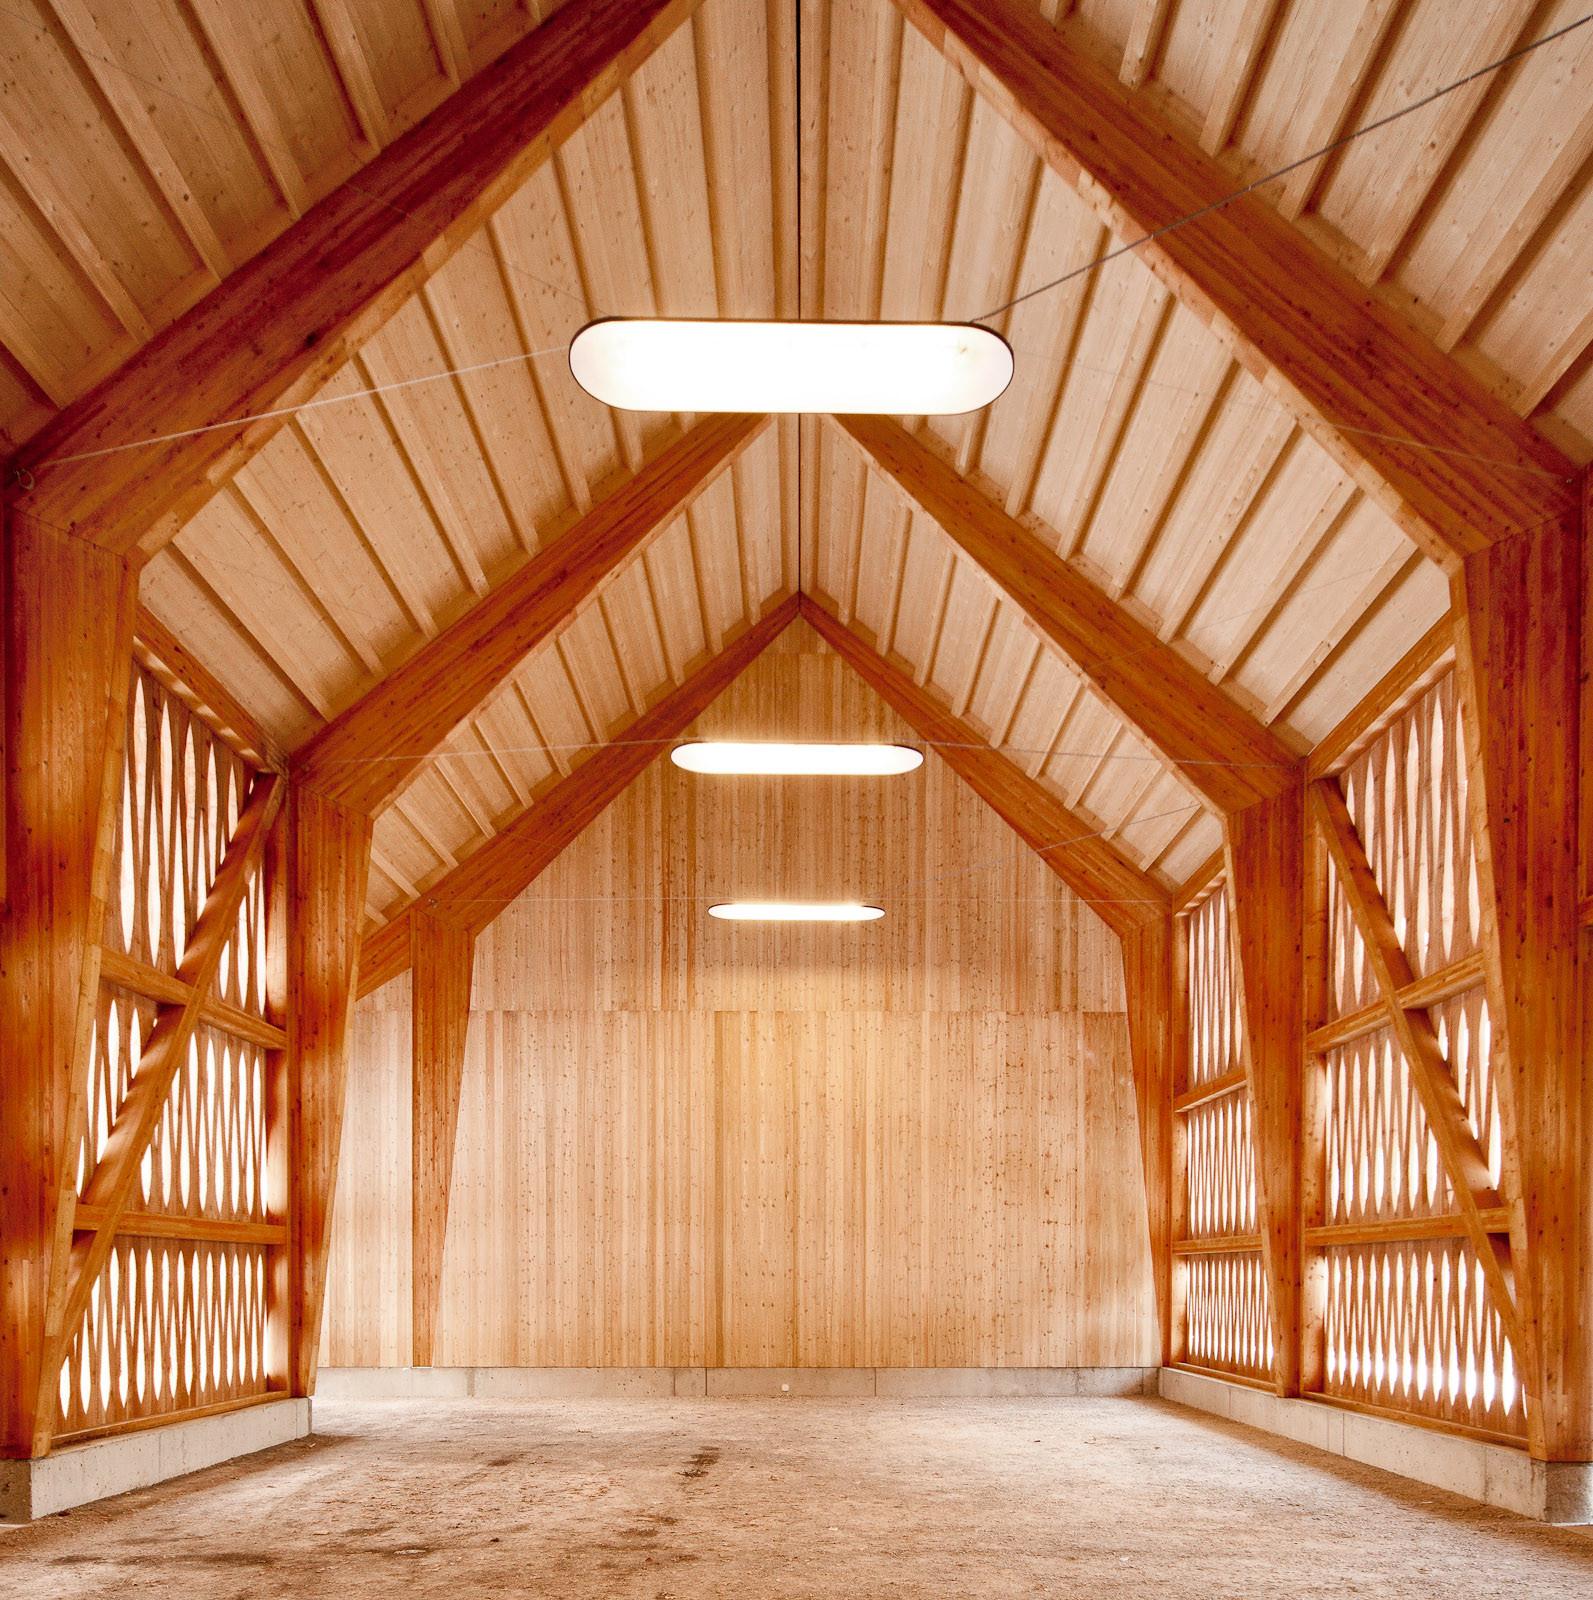 Dwelling House With Barn Michael Meier Marius Hug